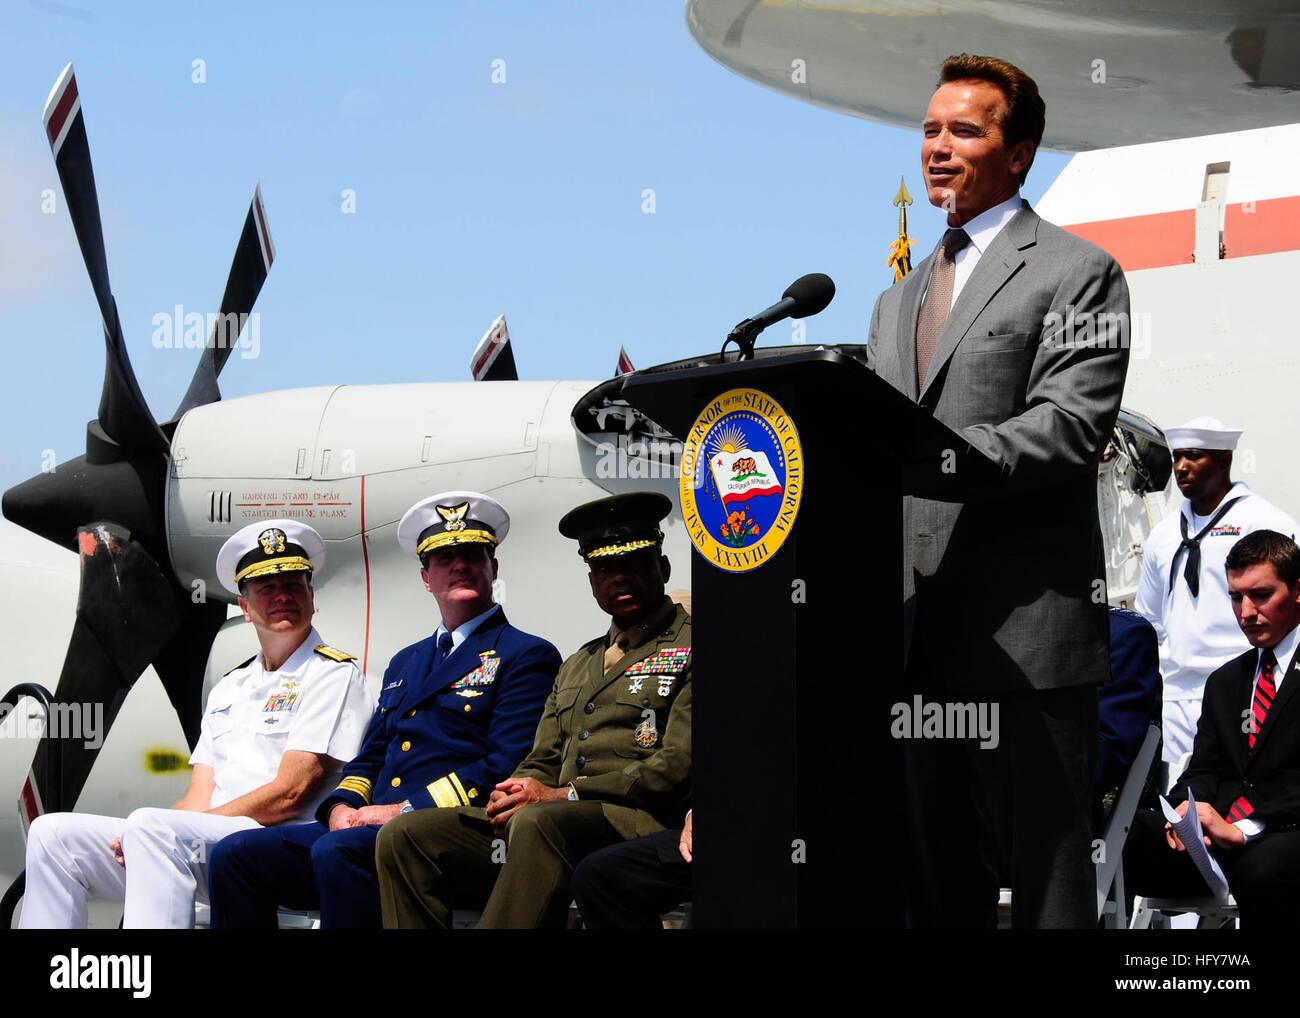 100603-N-8607R-069 SAN DIEGO (June 3, 2010) California Governor Arnold Schwarzenegger addresses veterans aboard - Stock Image